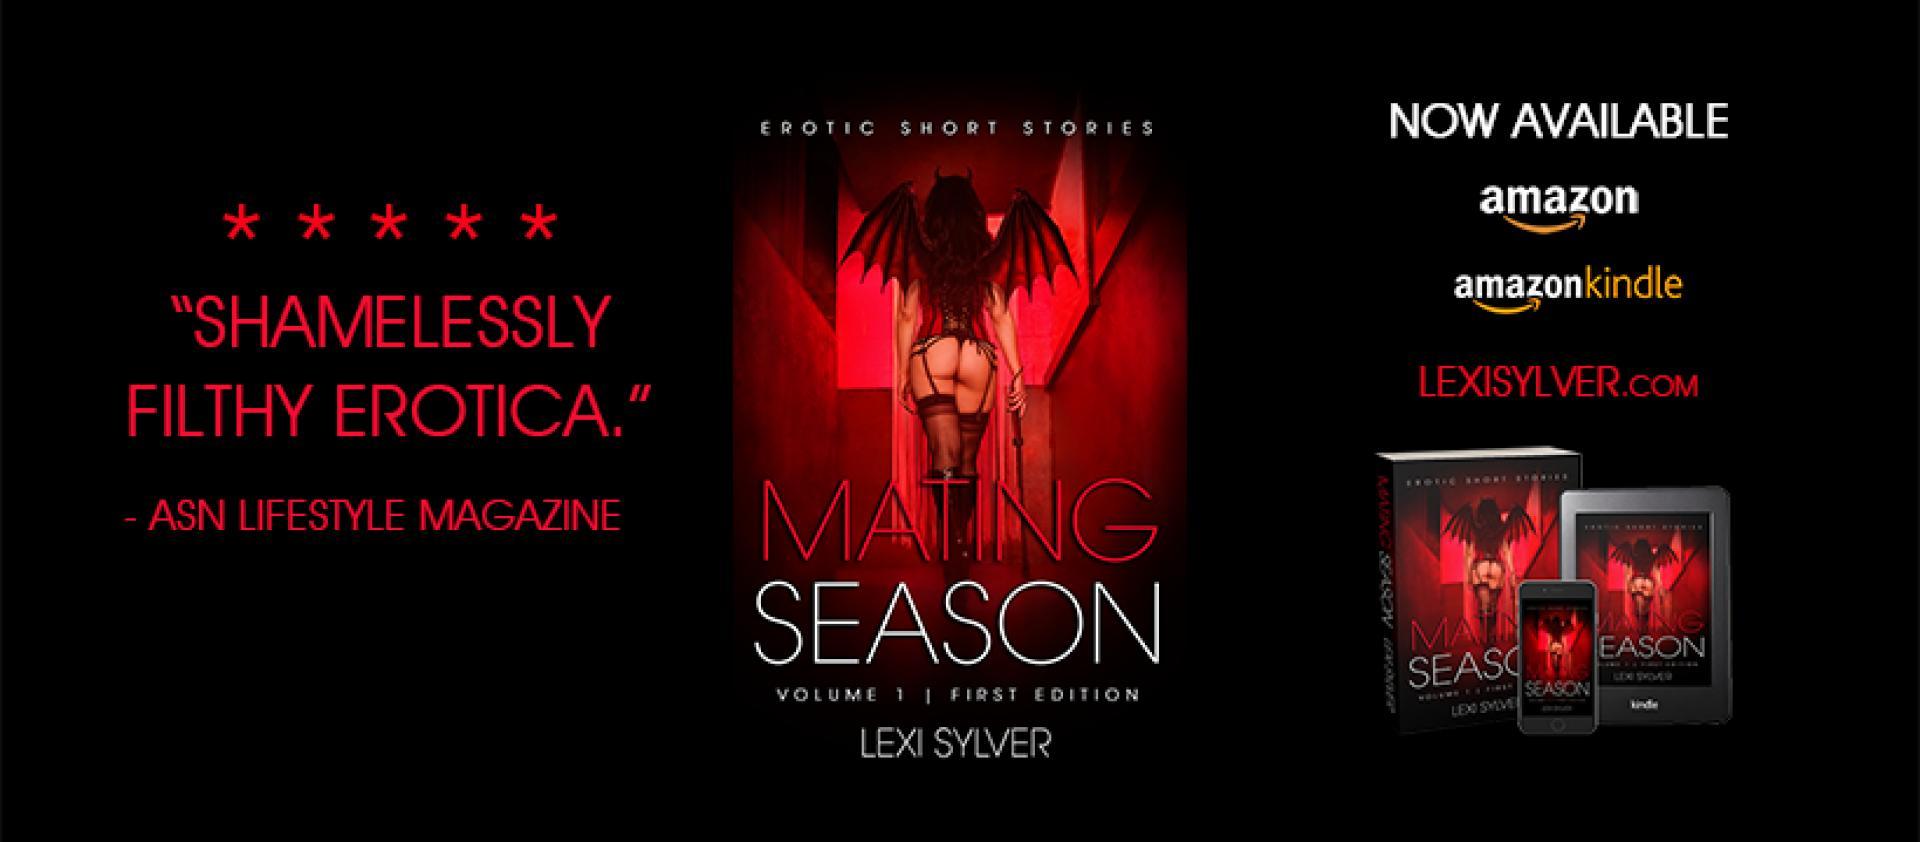 Lexi Sylver Mating Season: Erotic Short Stories